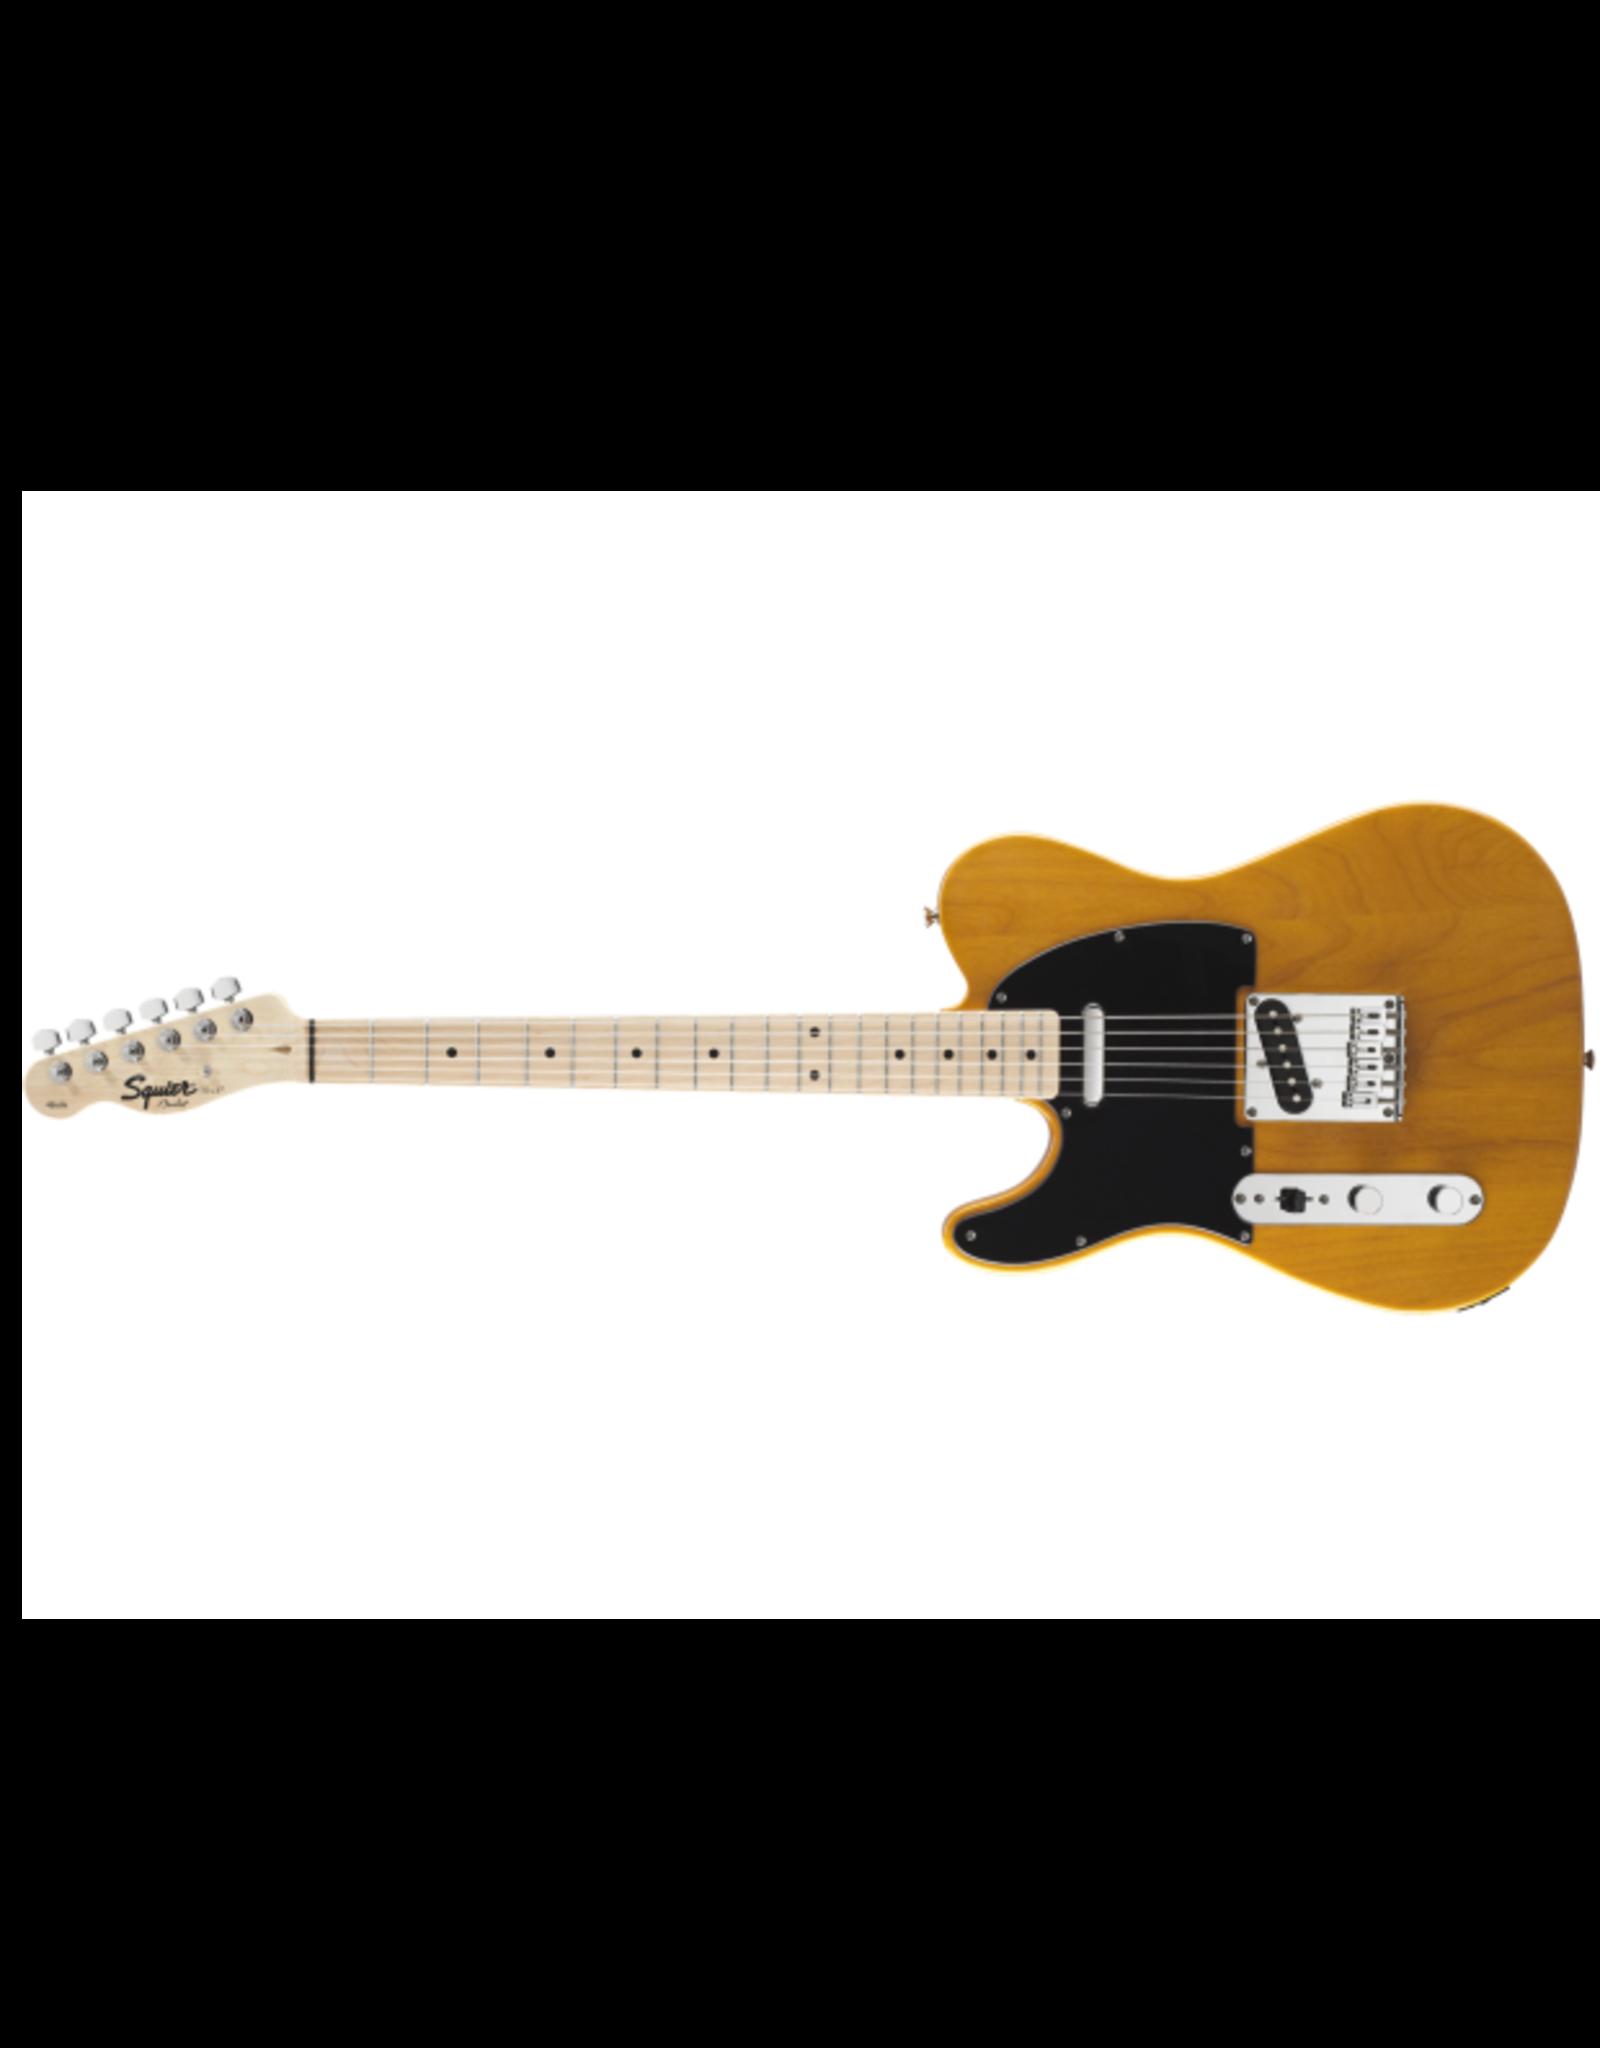 Fender Fender Squier Affinity Telecaster Butterscotch Blonde Lefty